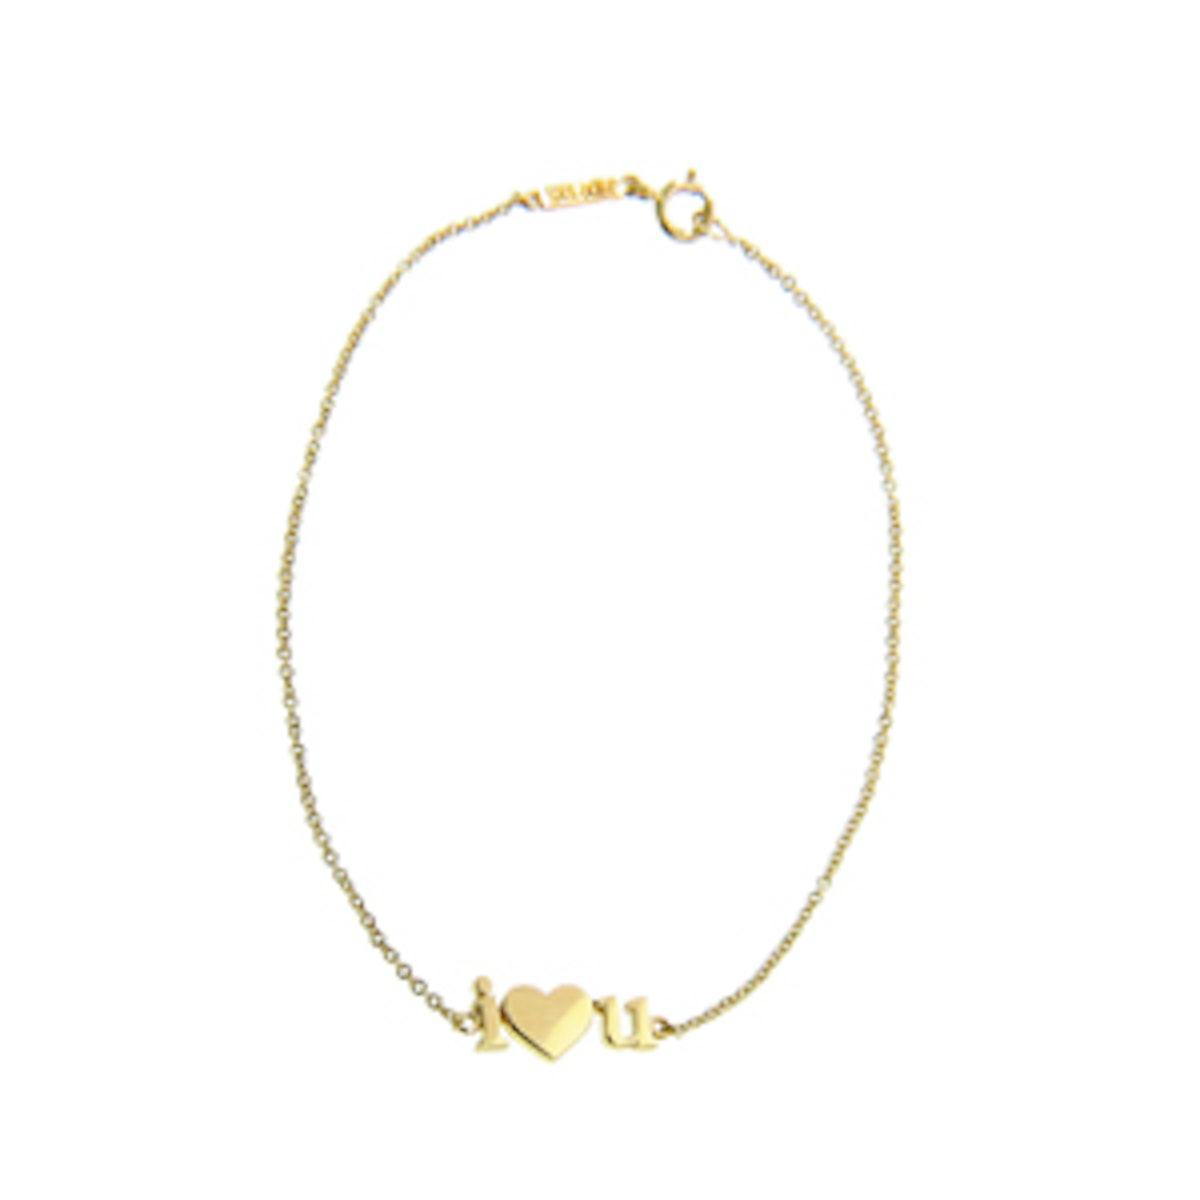 18K Yellow Gold I Heart You Bracelet